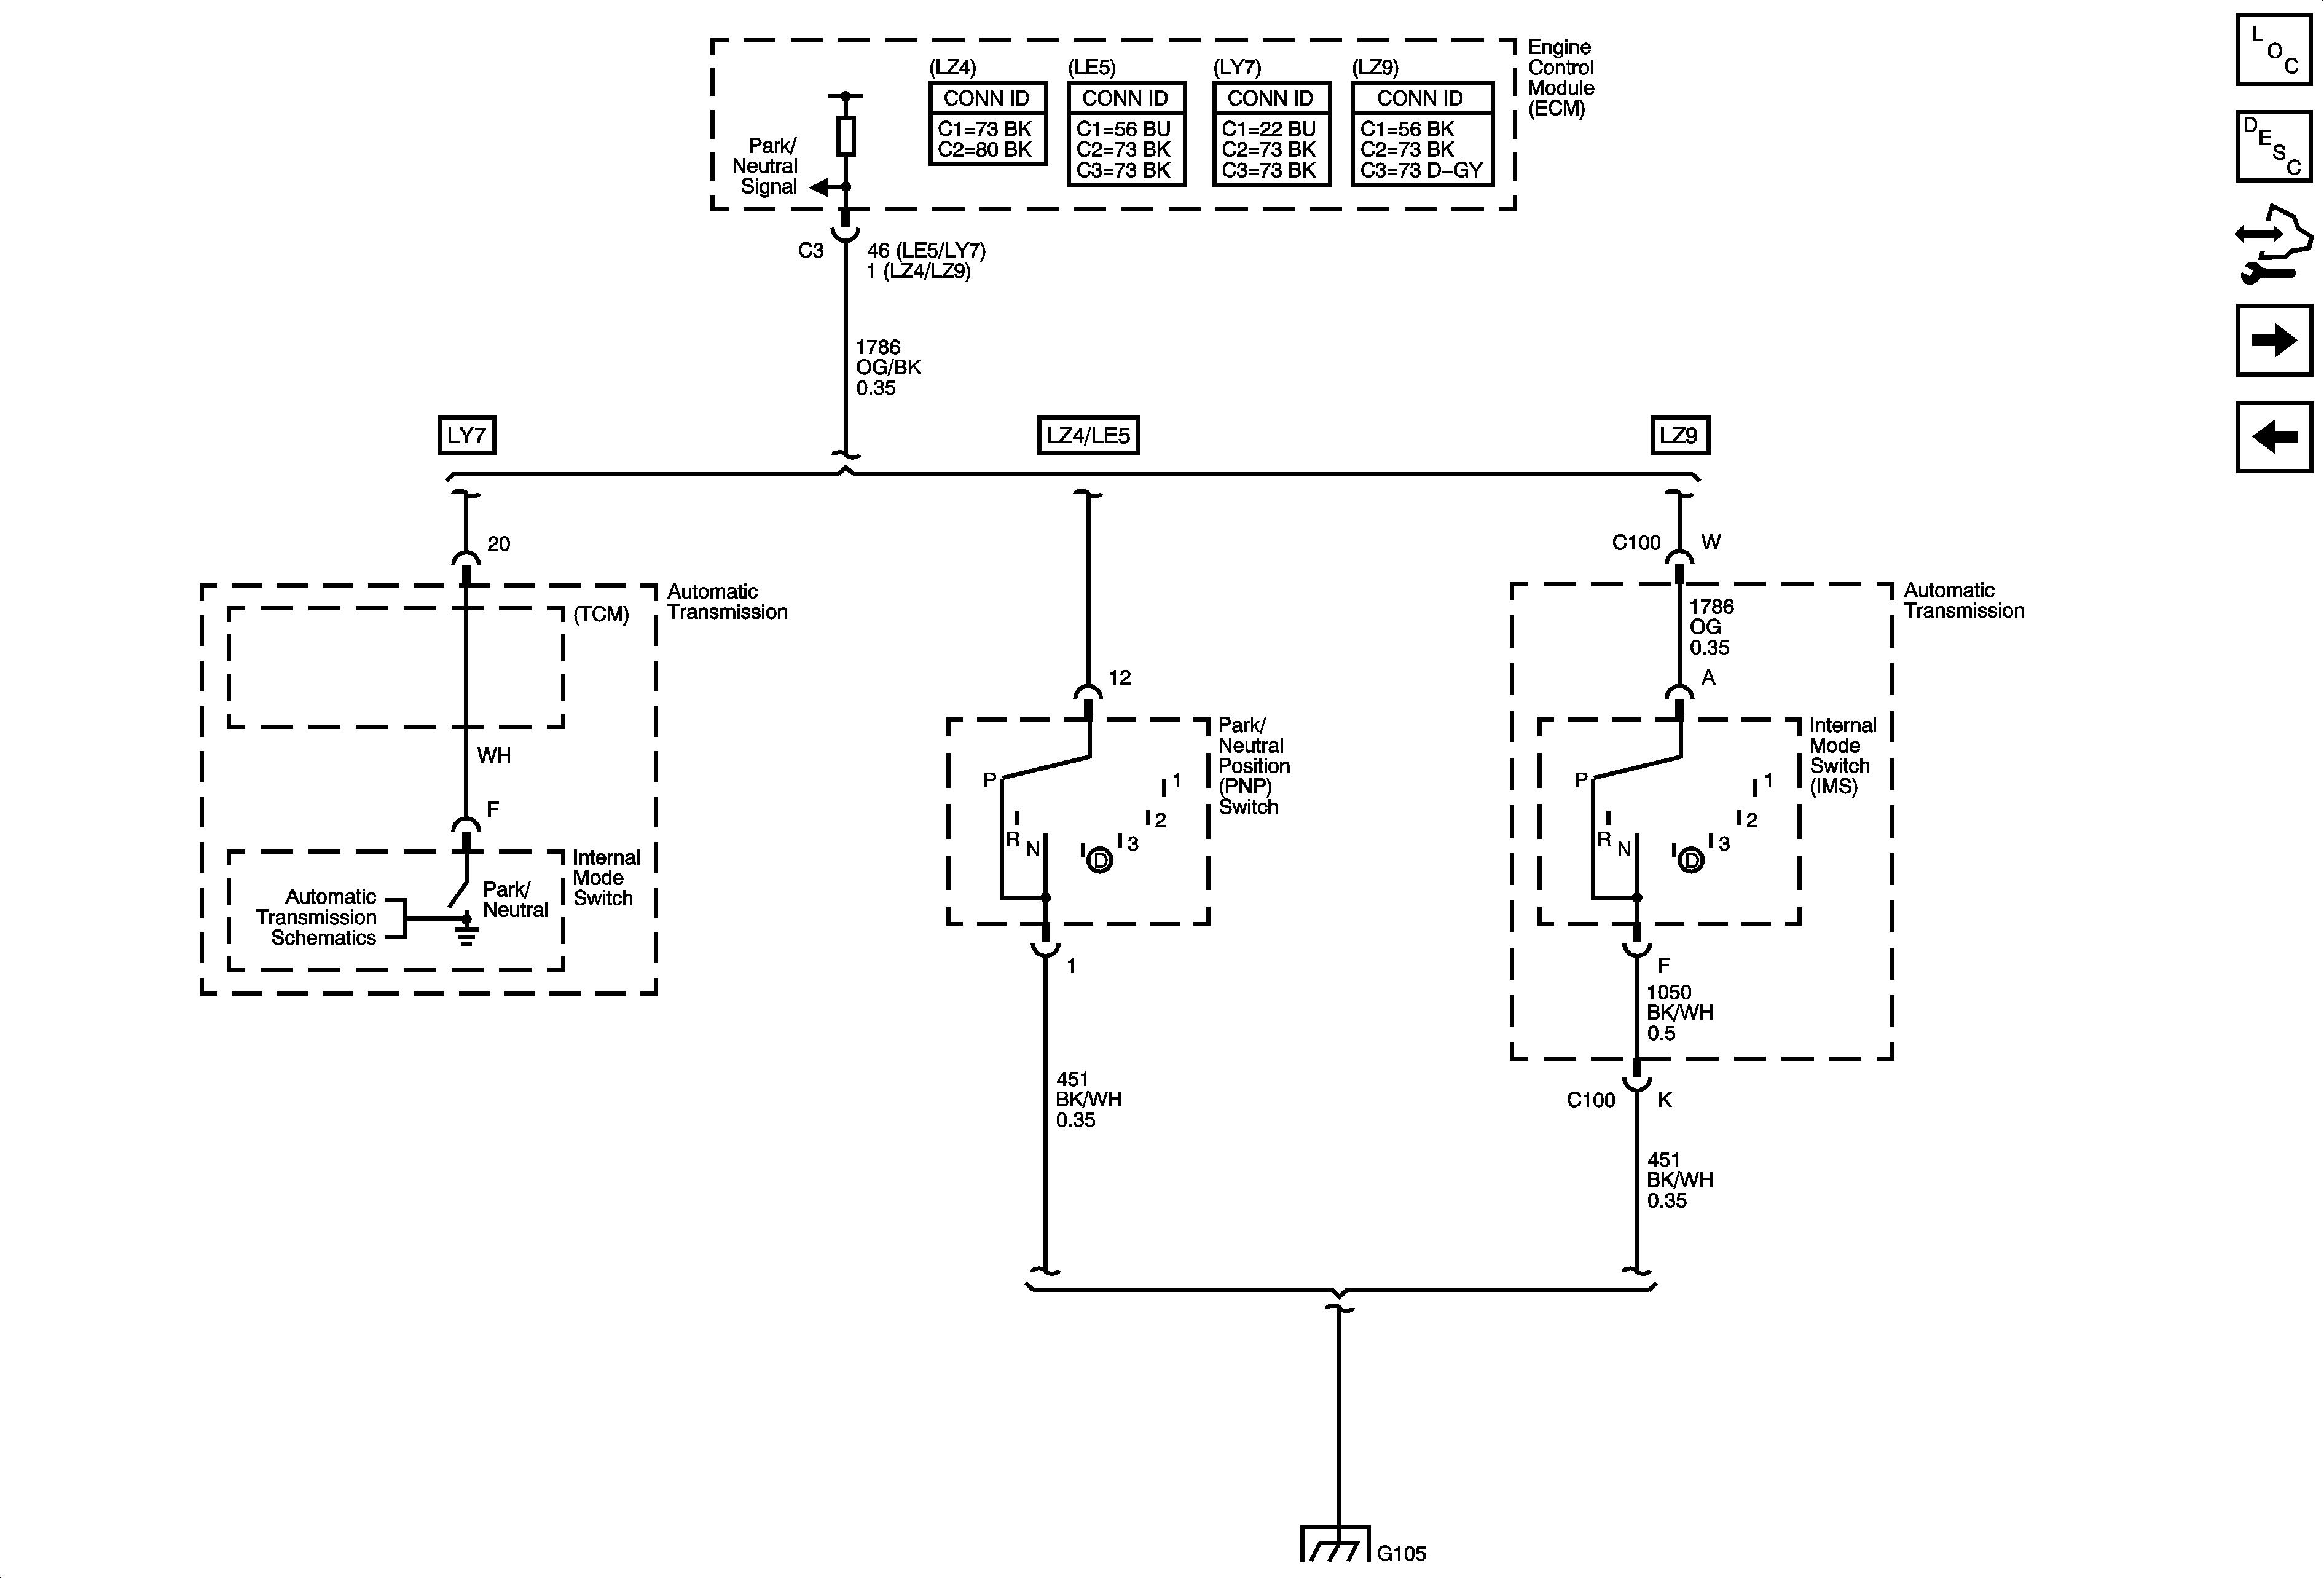 56 pontiac wiring diagram 2007 g6 3 5l wont crank pontiac g6 forum  2007 g6 3 5l wont crank pontiac g6 forum